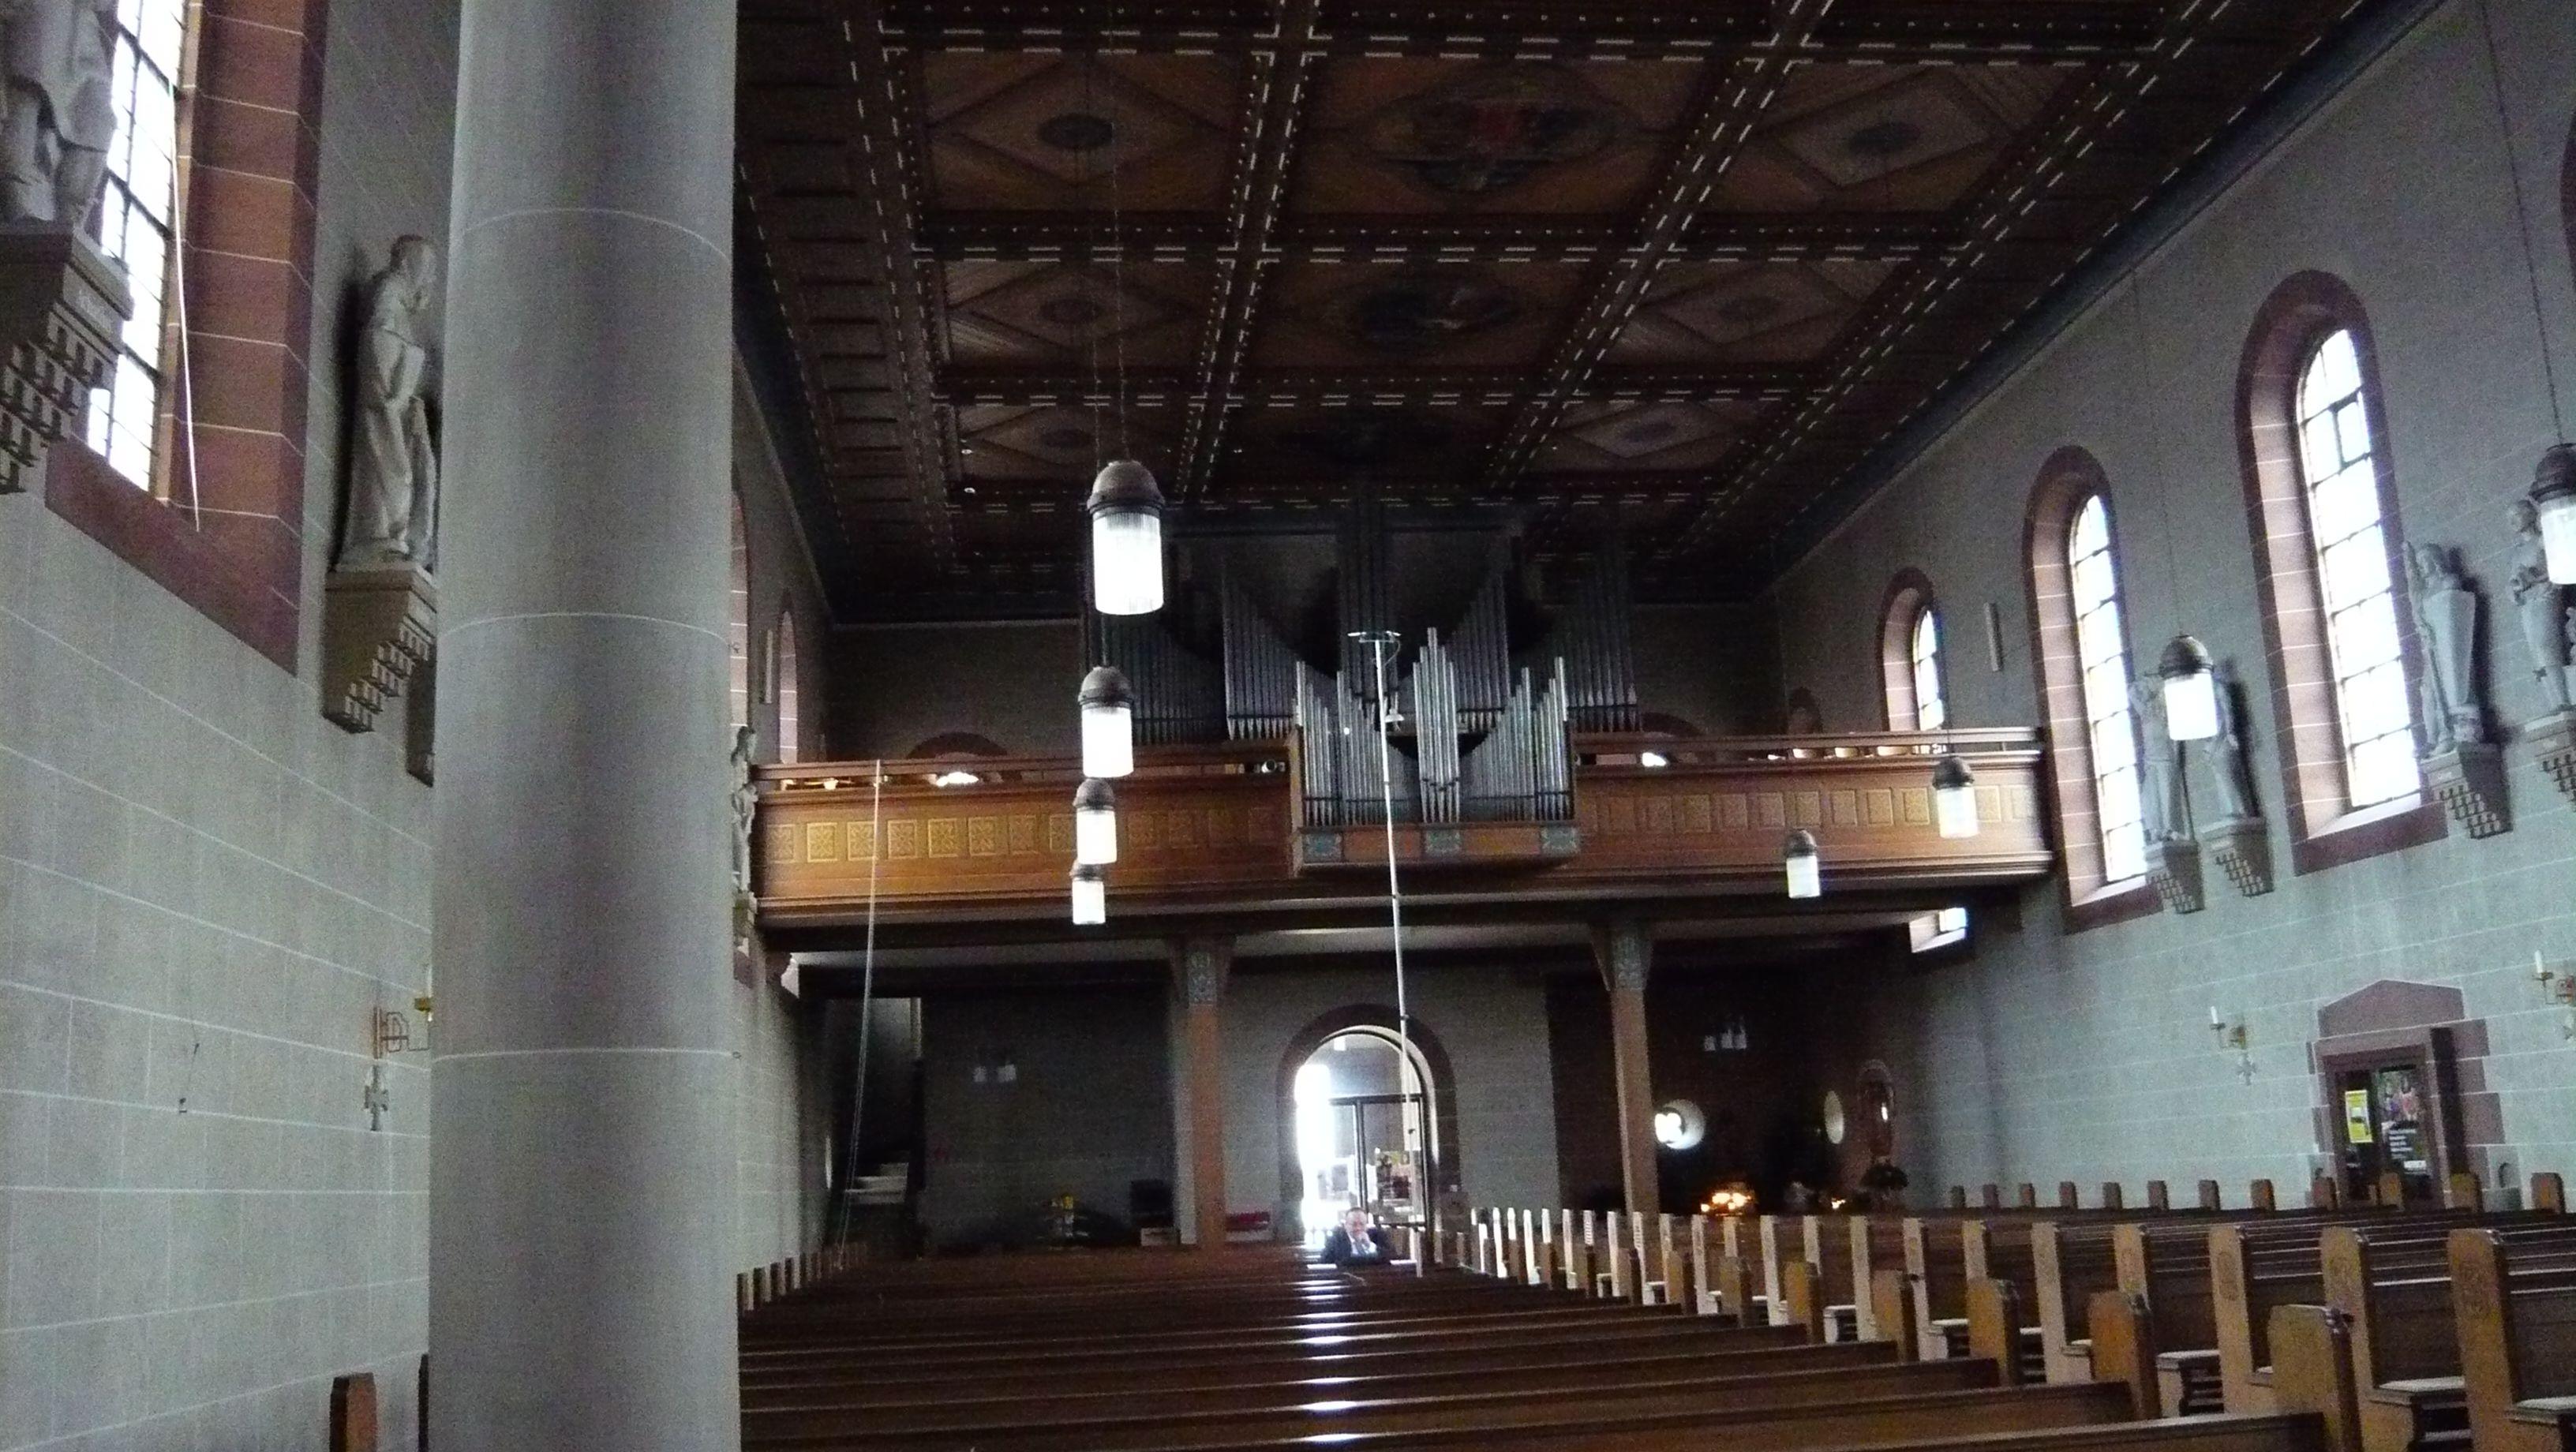 OrgelStJakobuskircheKarlsdorf210310